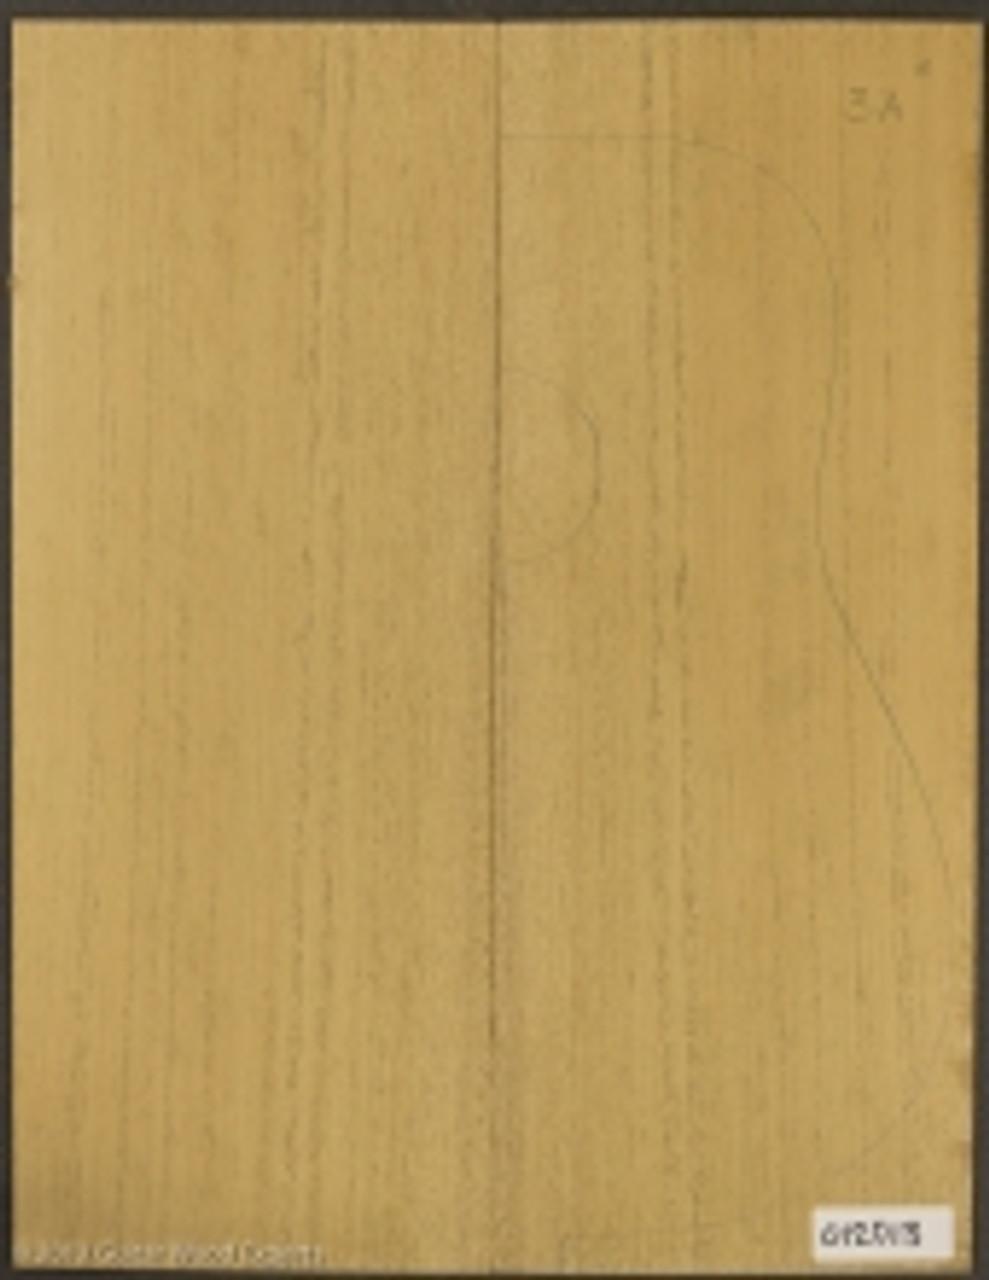 3A Genuine Mahogany Sound Boards